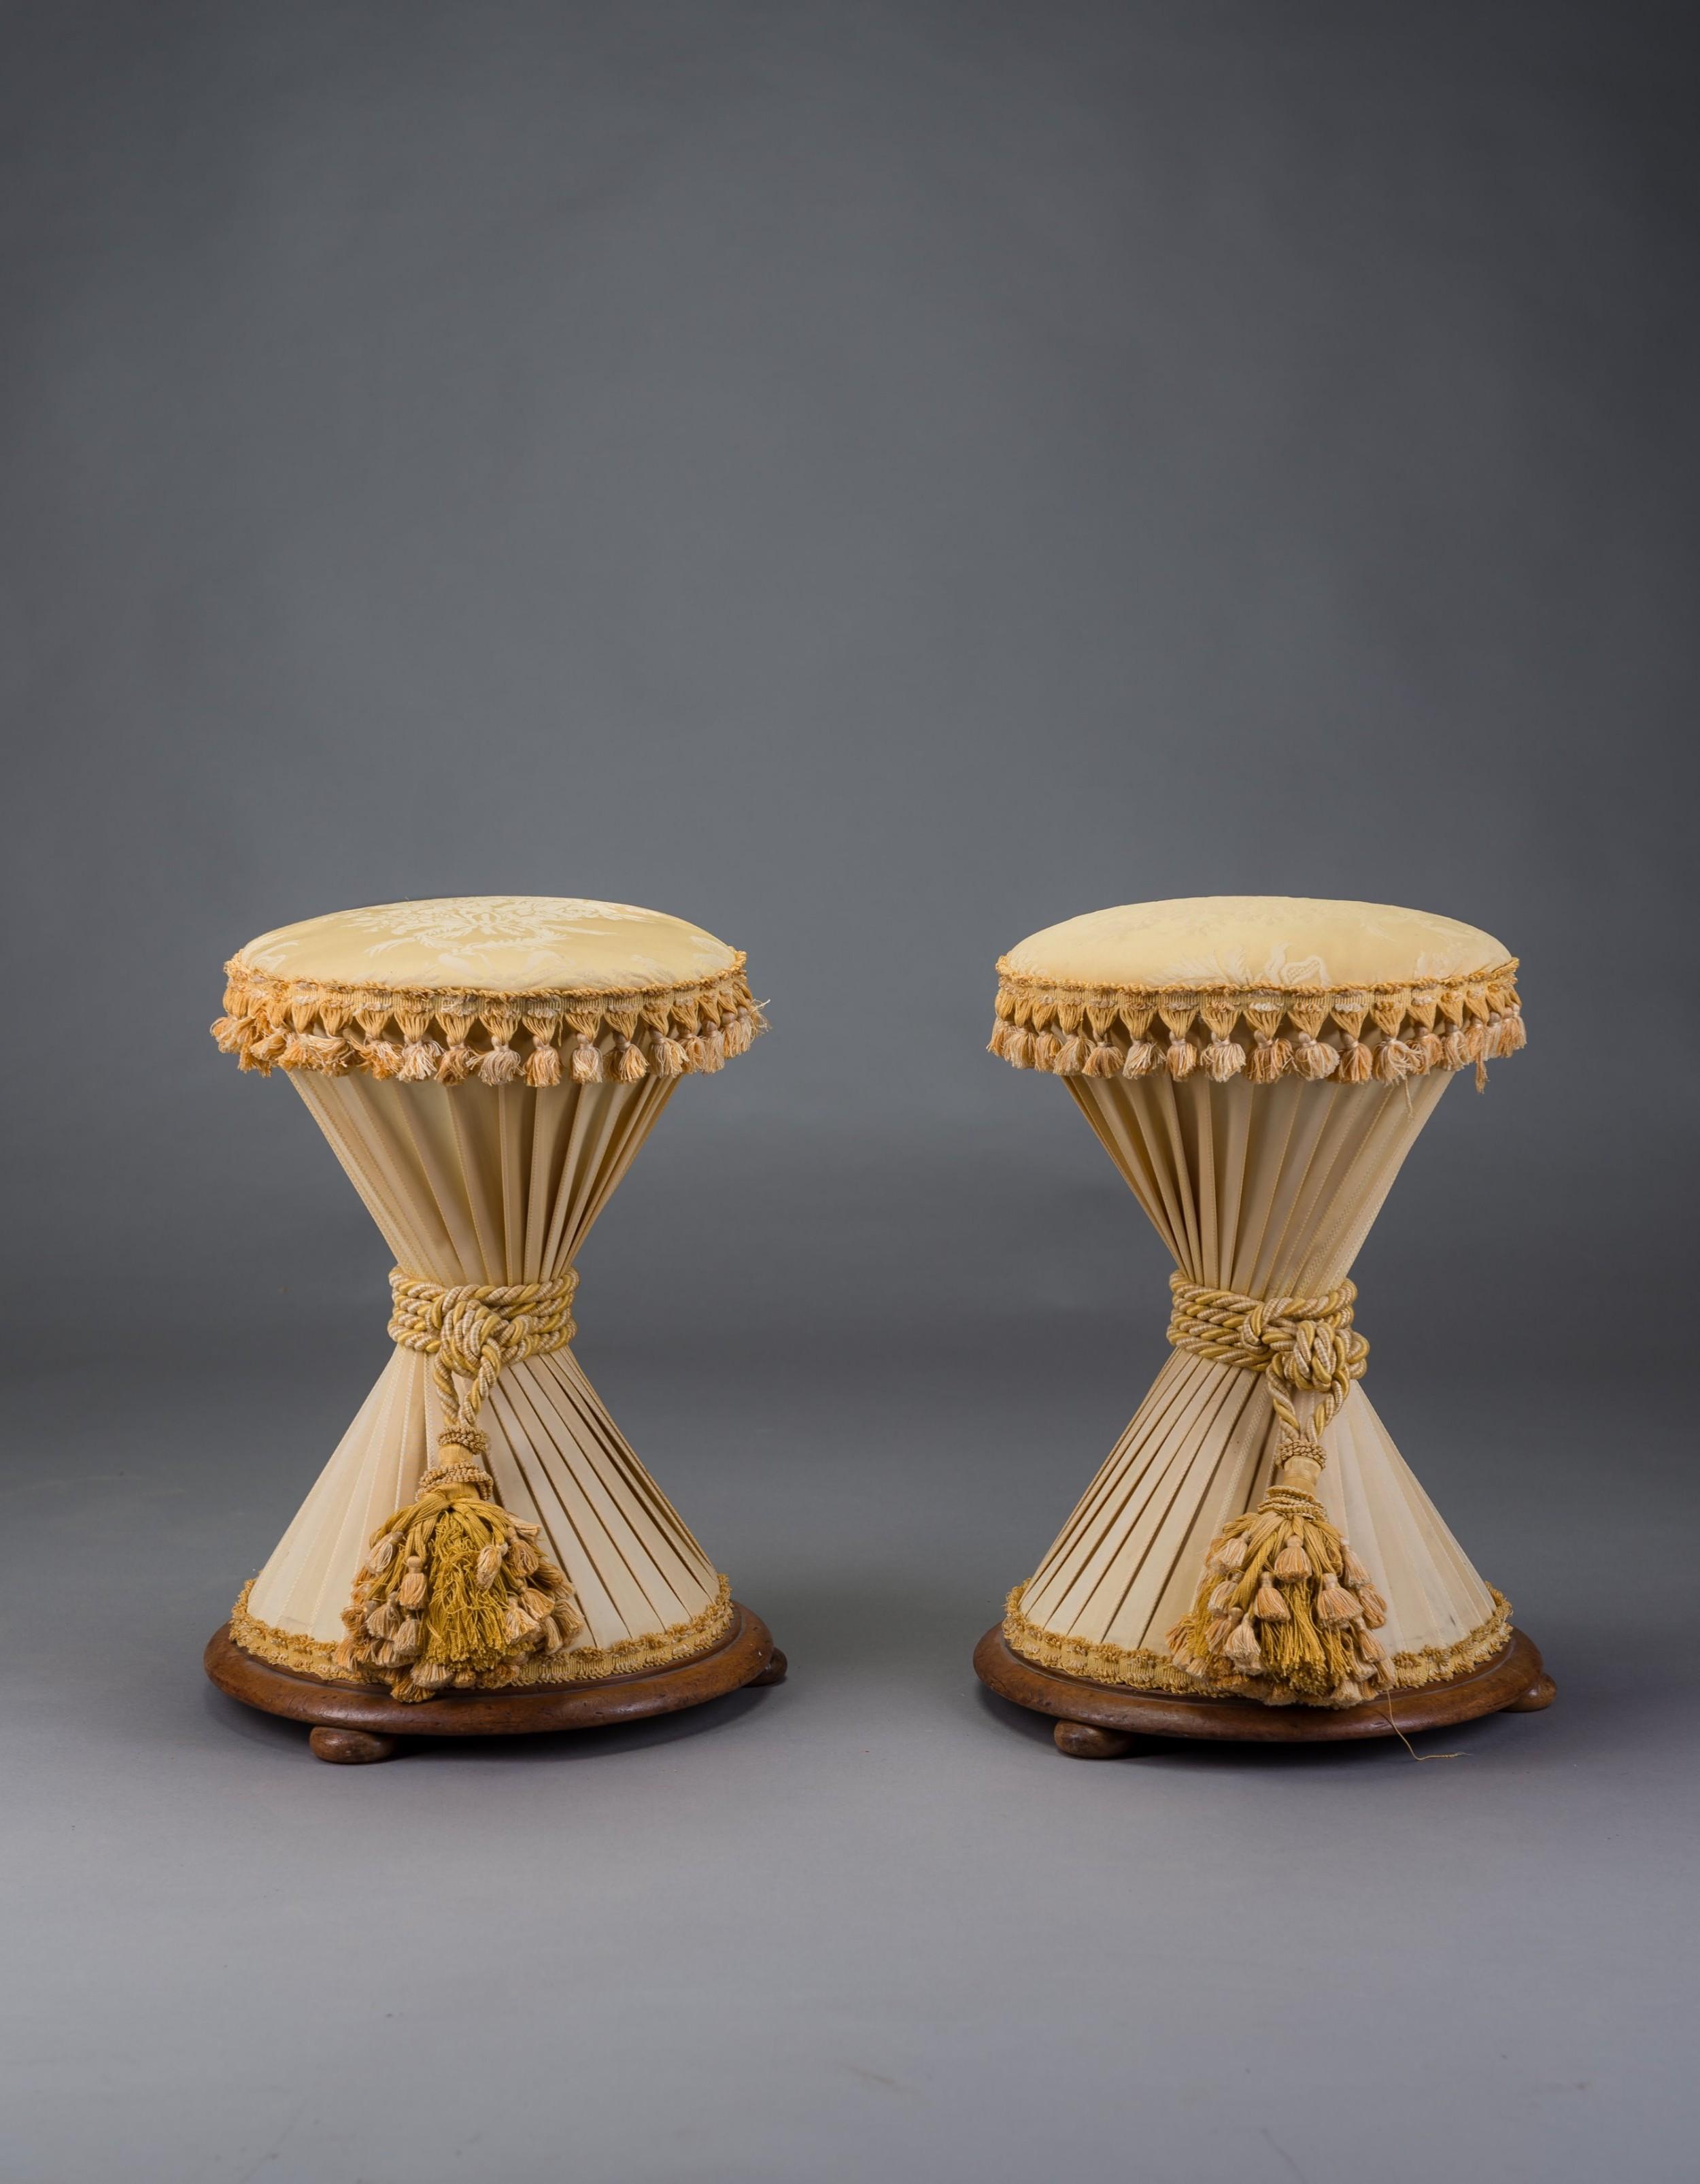 pair of hourglass stools